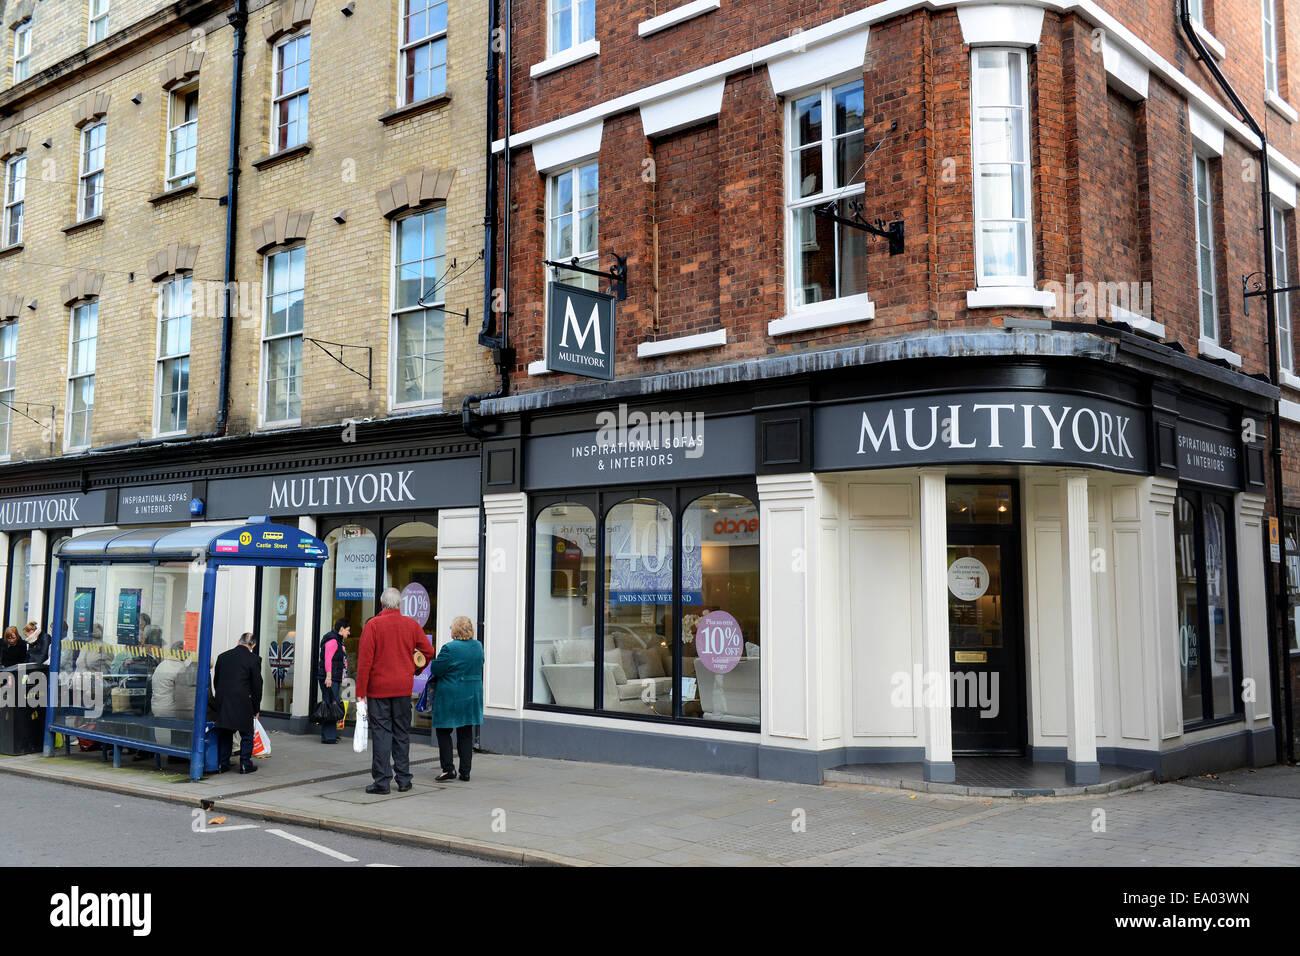 Multiyork interiors shop shops store stores Shrewsbury Uk - Stock Image